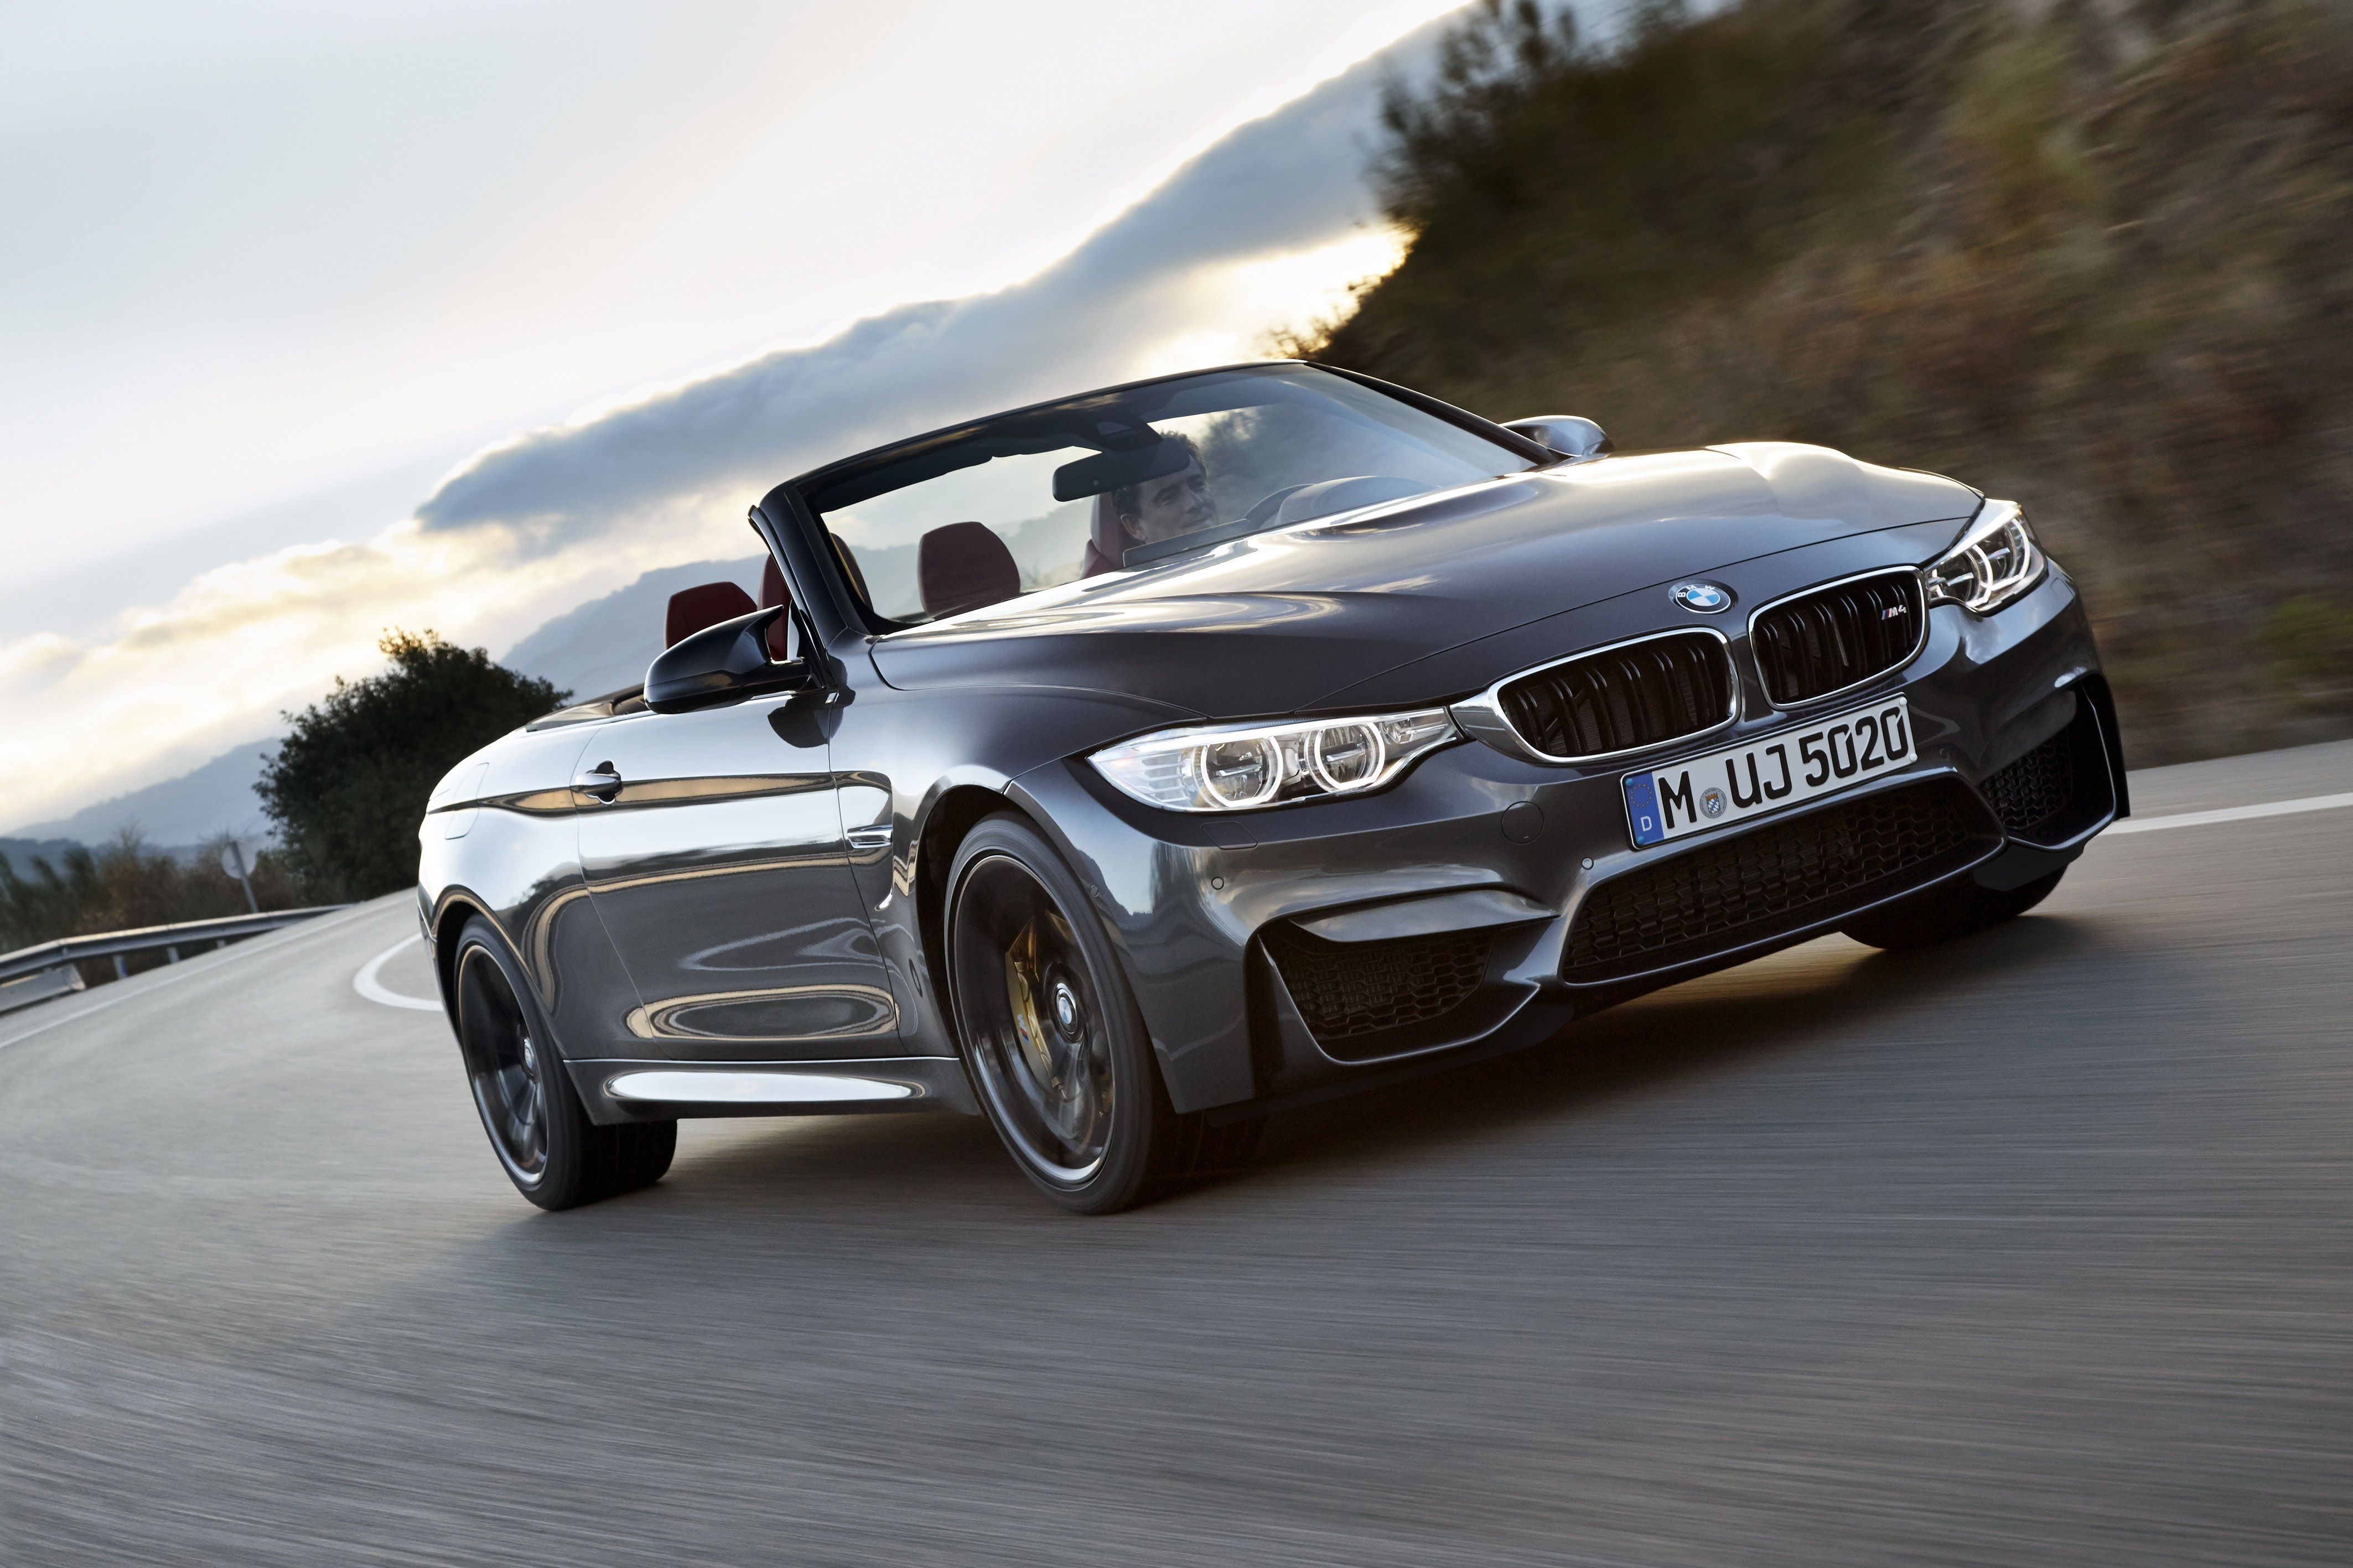 2014 BMW M4 Convertible - Just Amazing